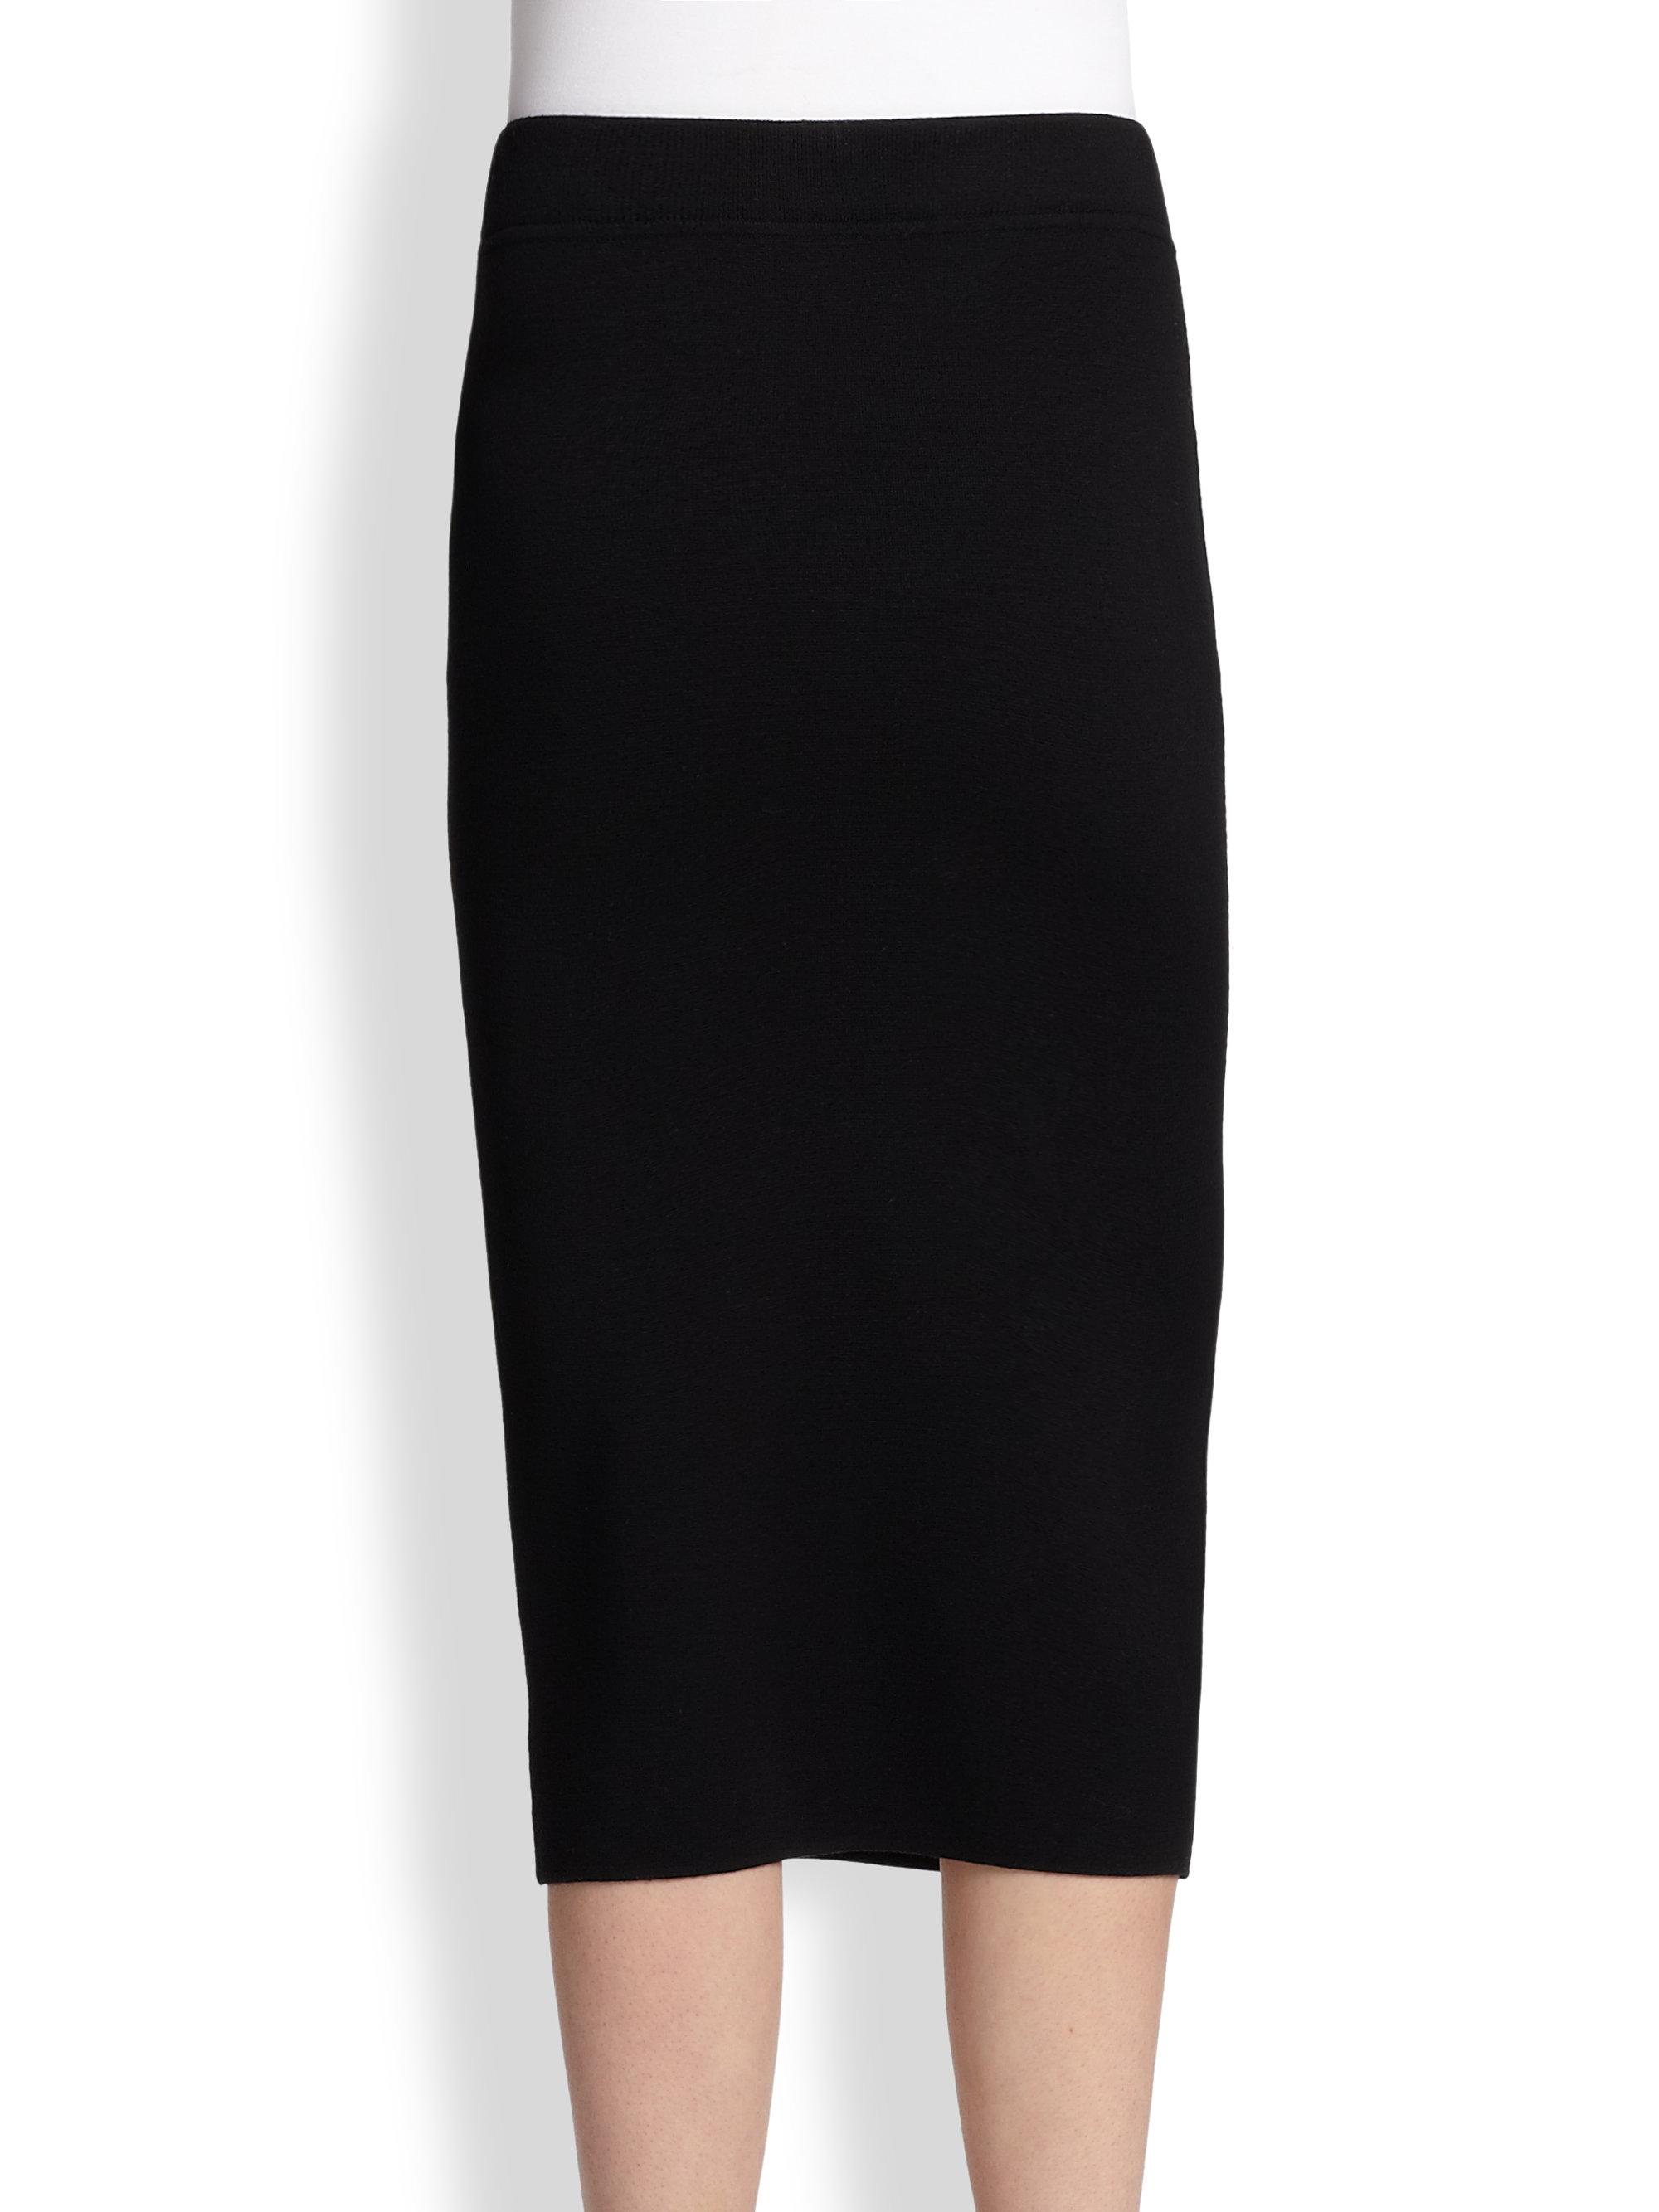 michael kors merino wool pencil skirt in black lyst